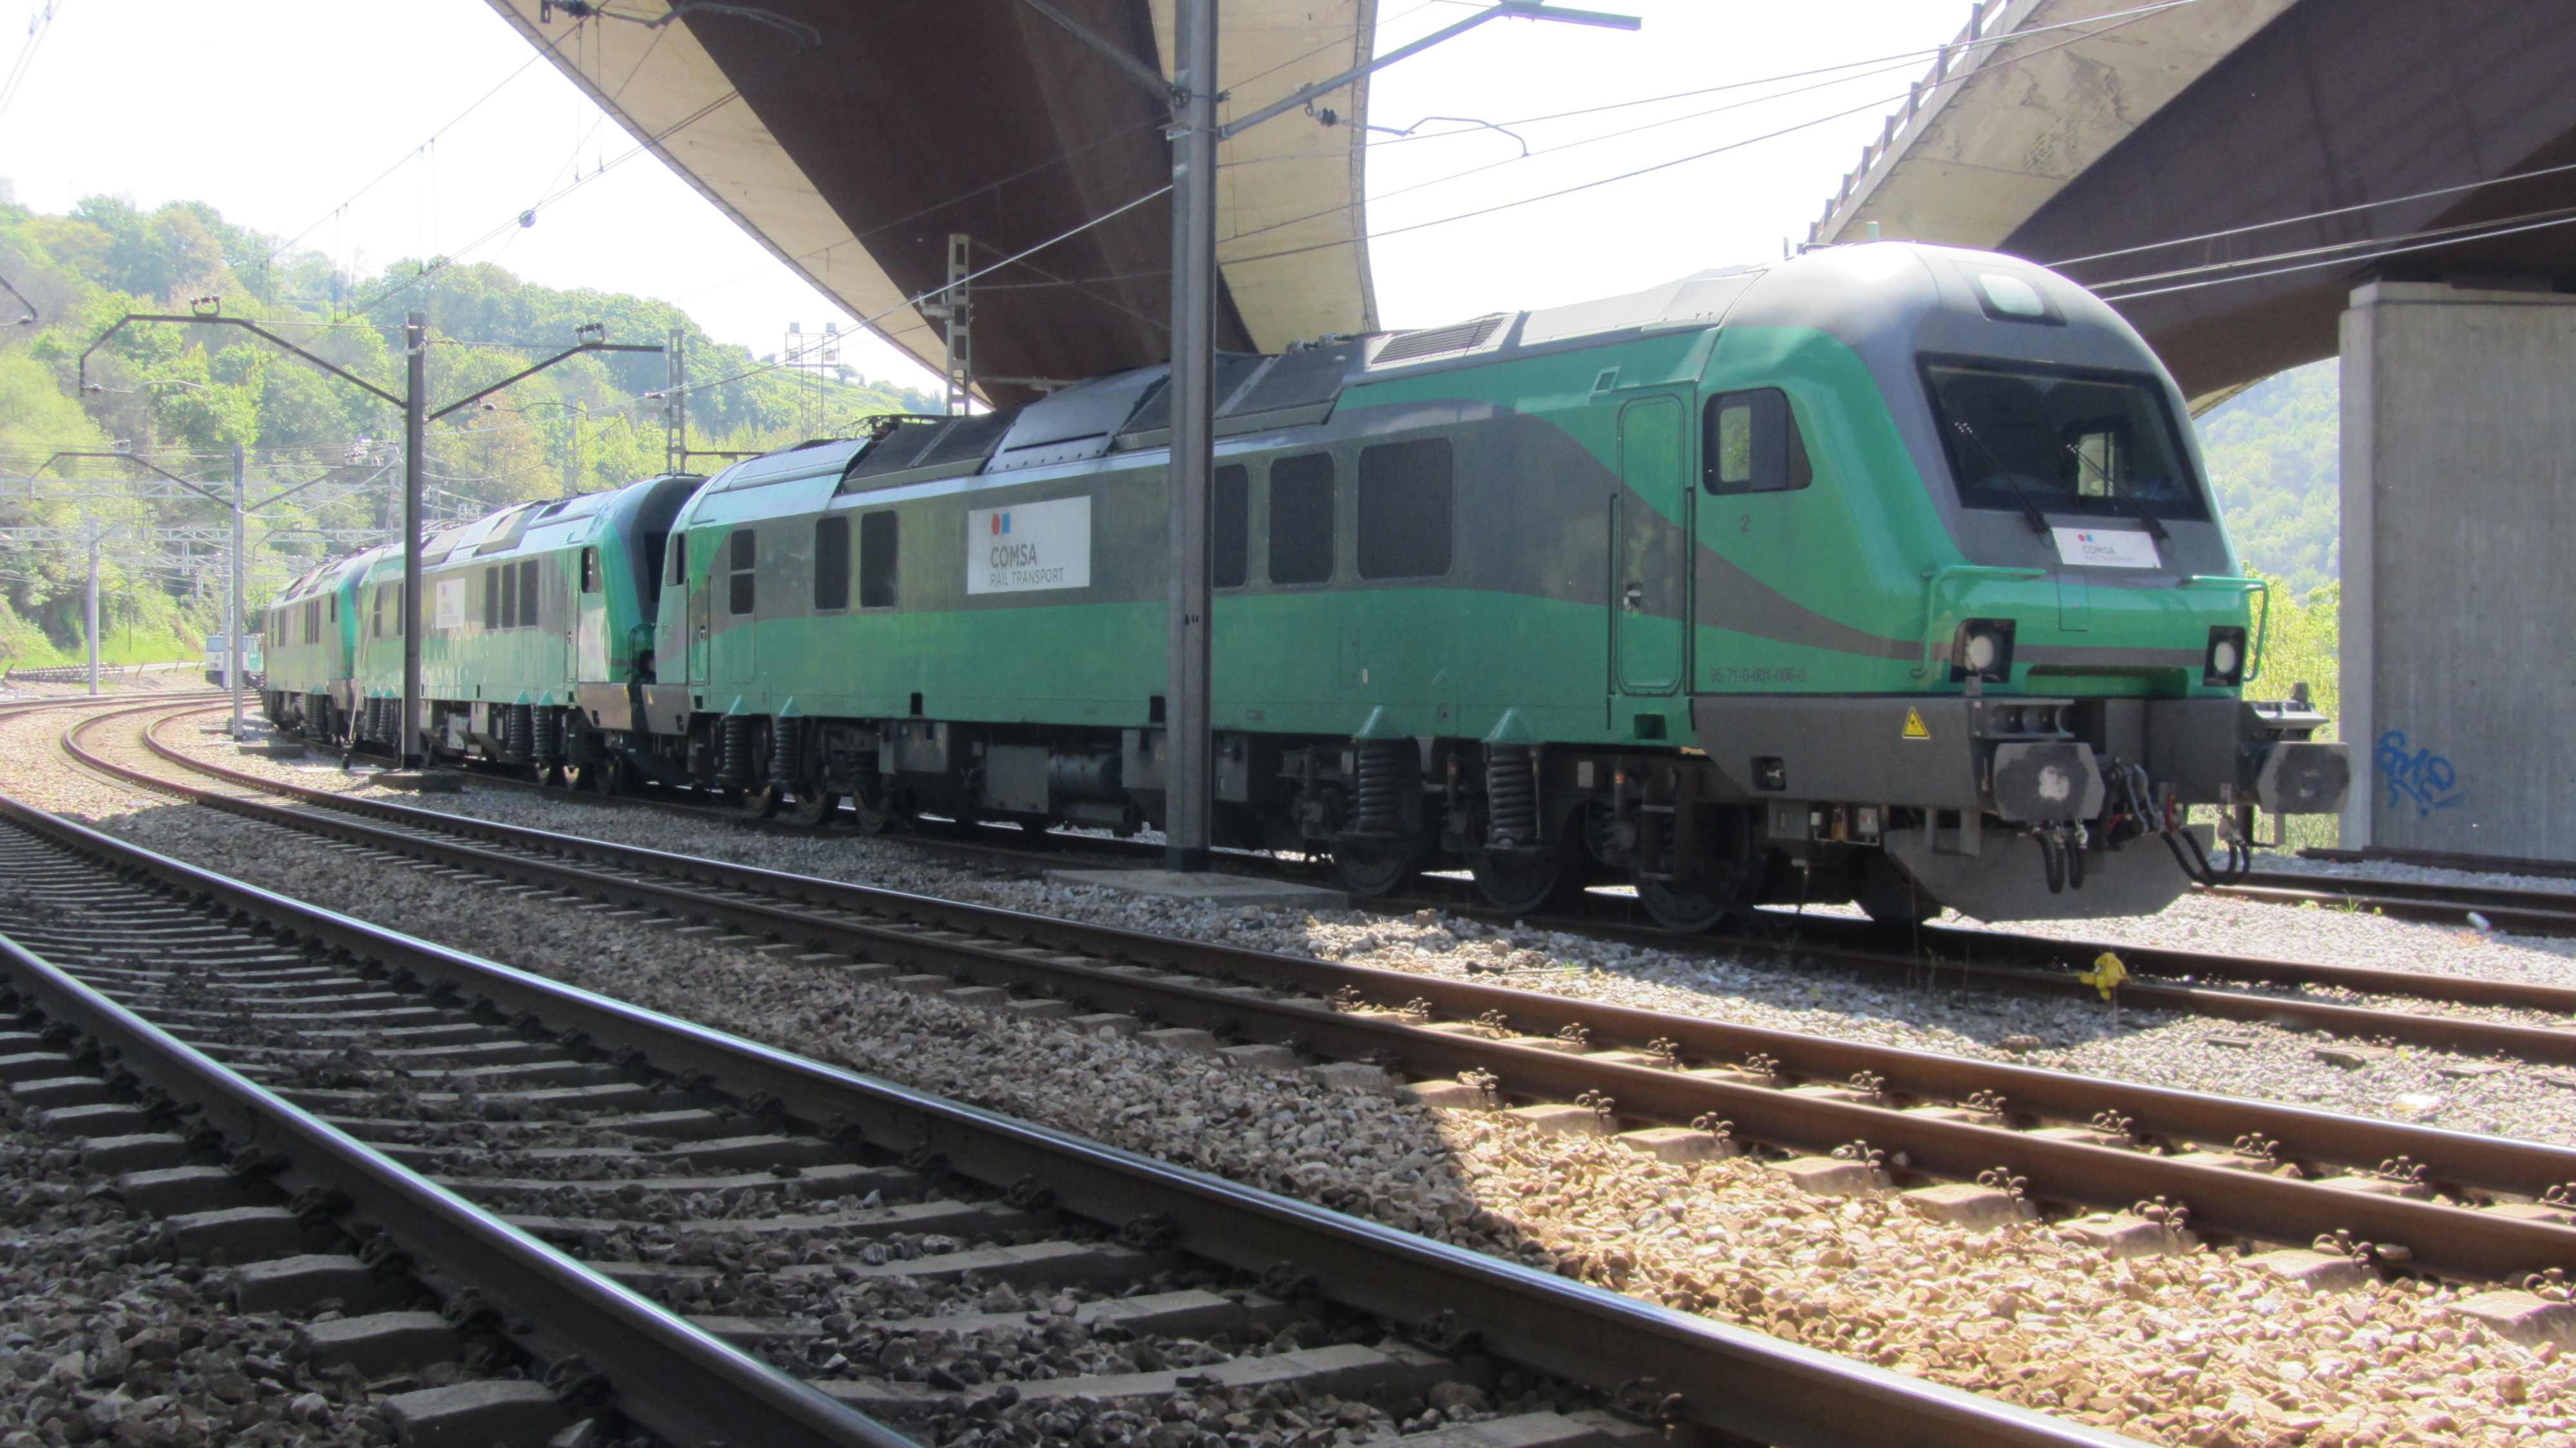 2013-04-24-Soto-de-Rey-Tren-Comsa-triple-tracción_01.JPG